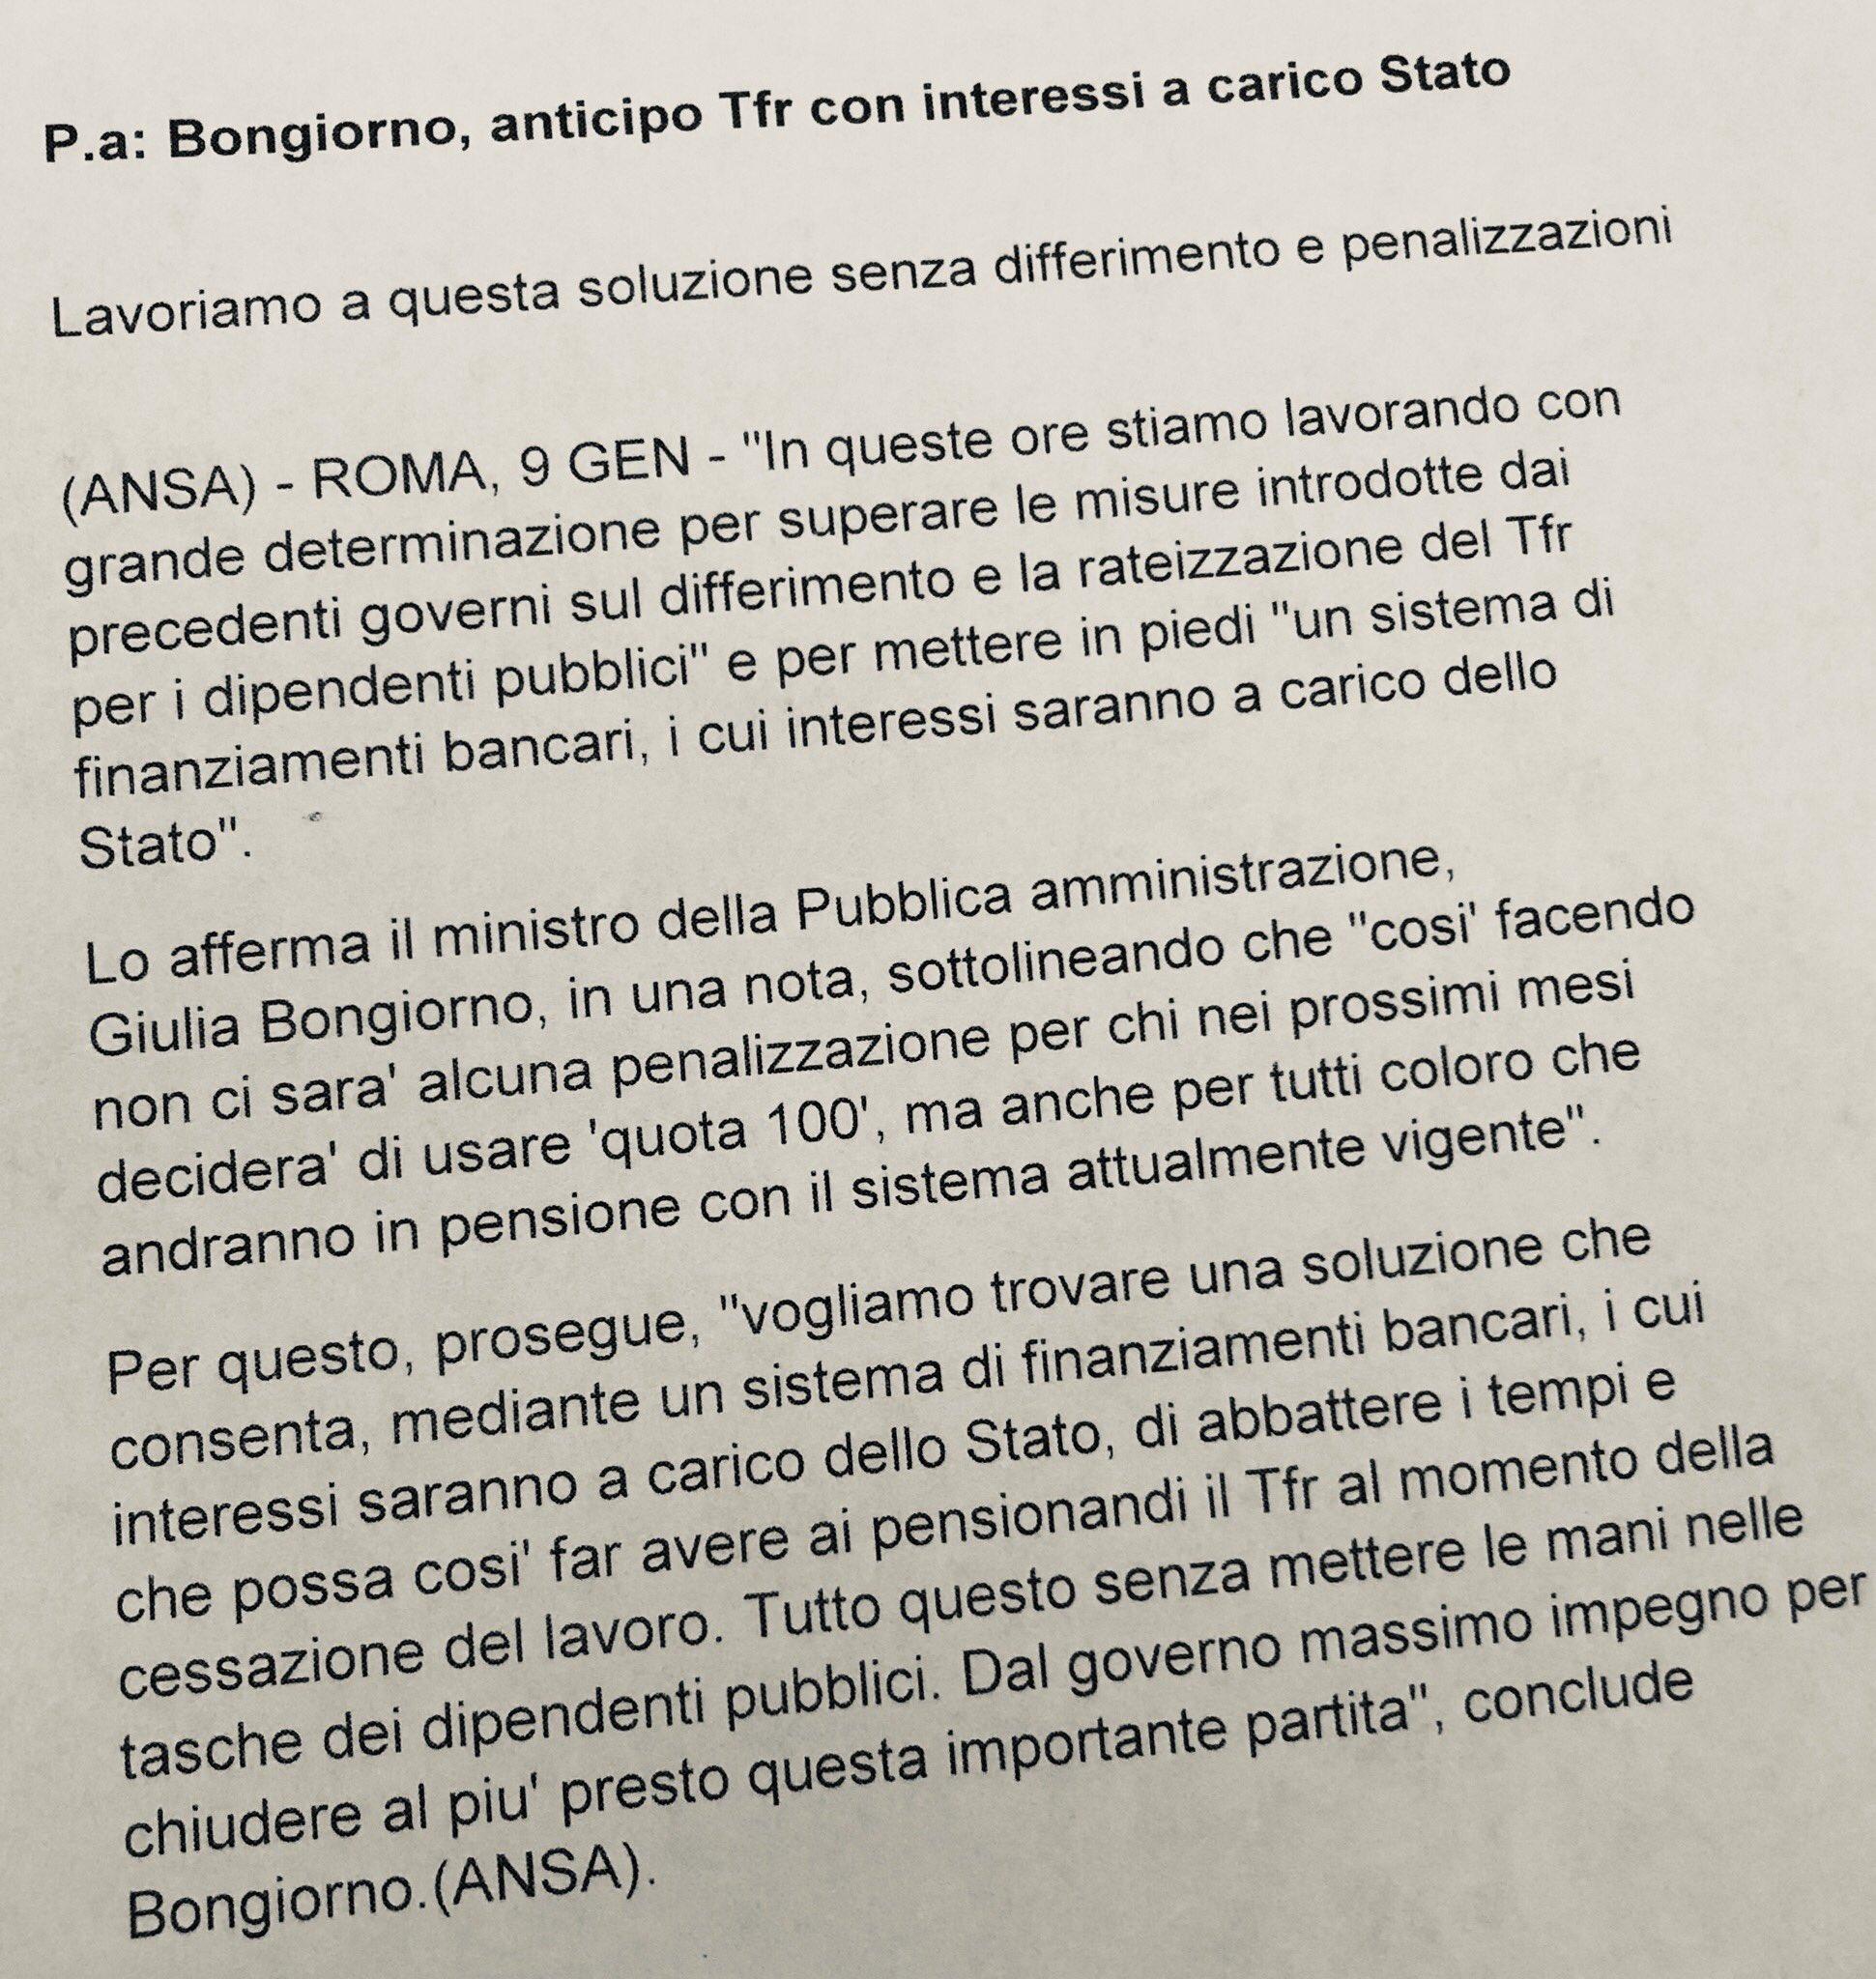 Giulia Bongiorno on Twitter: